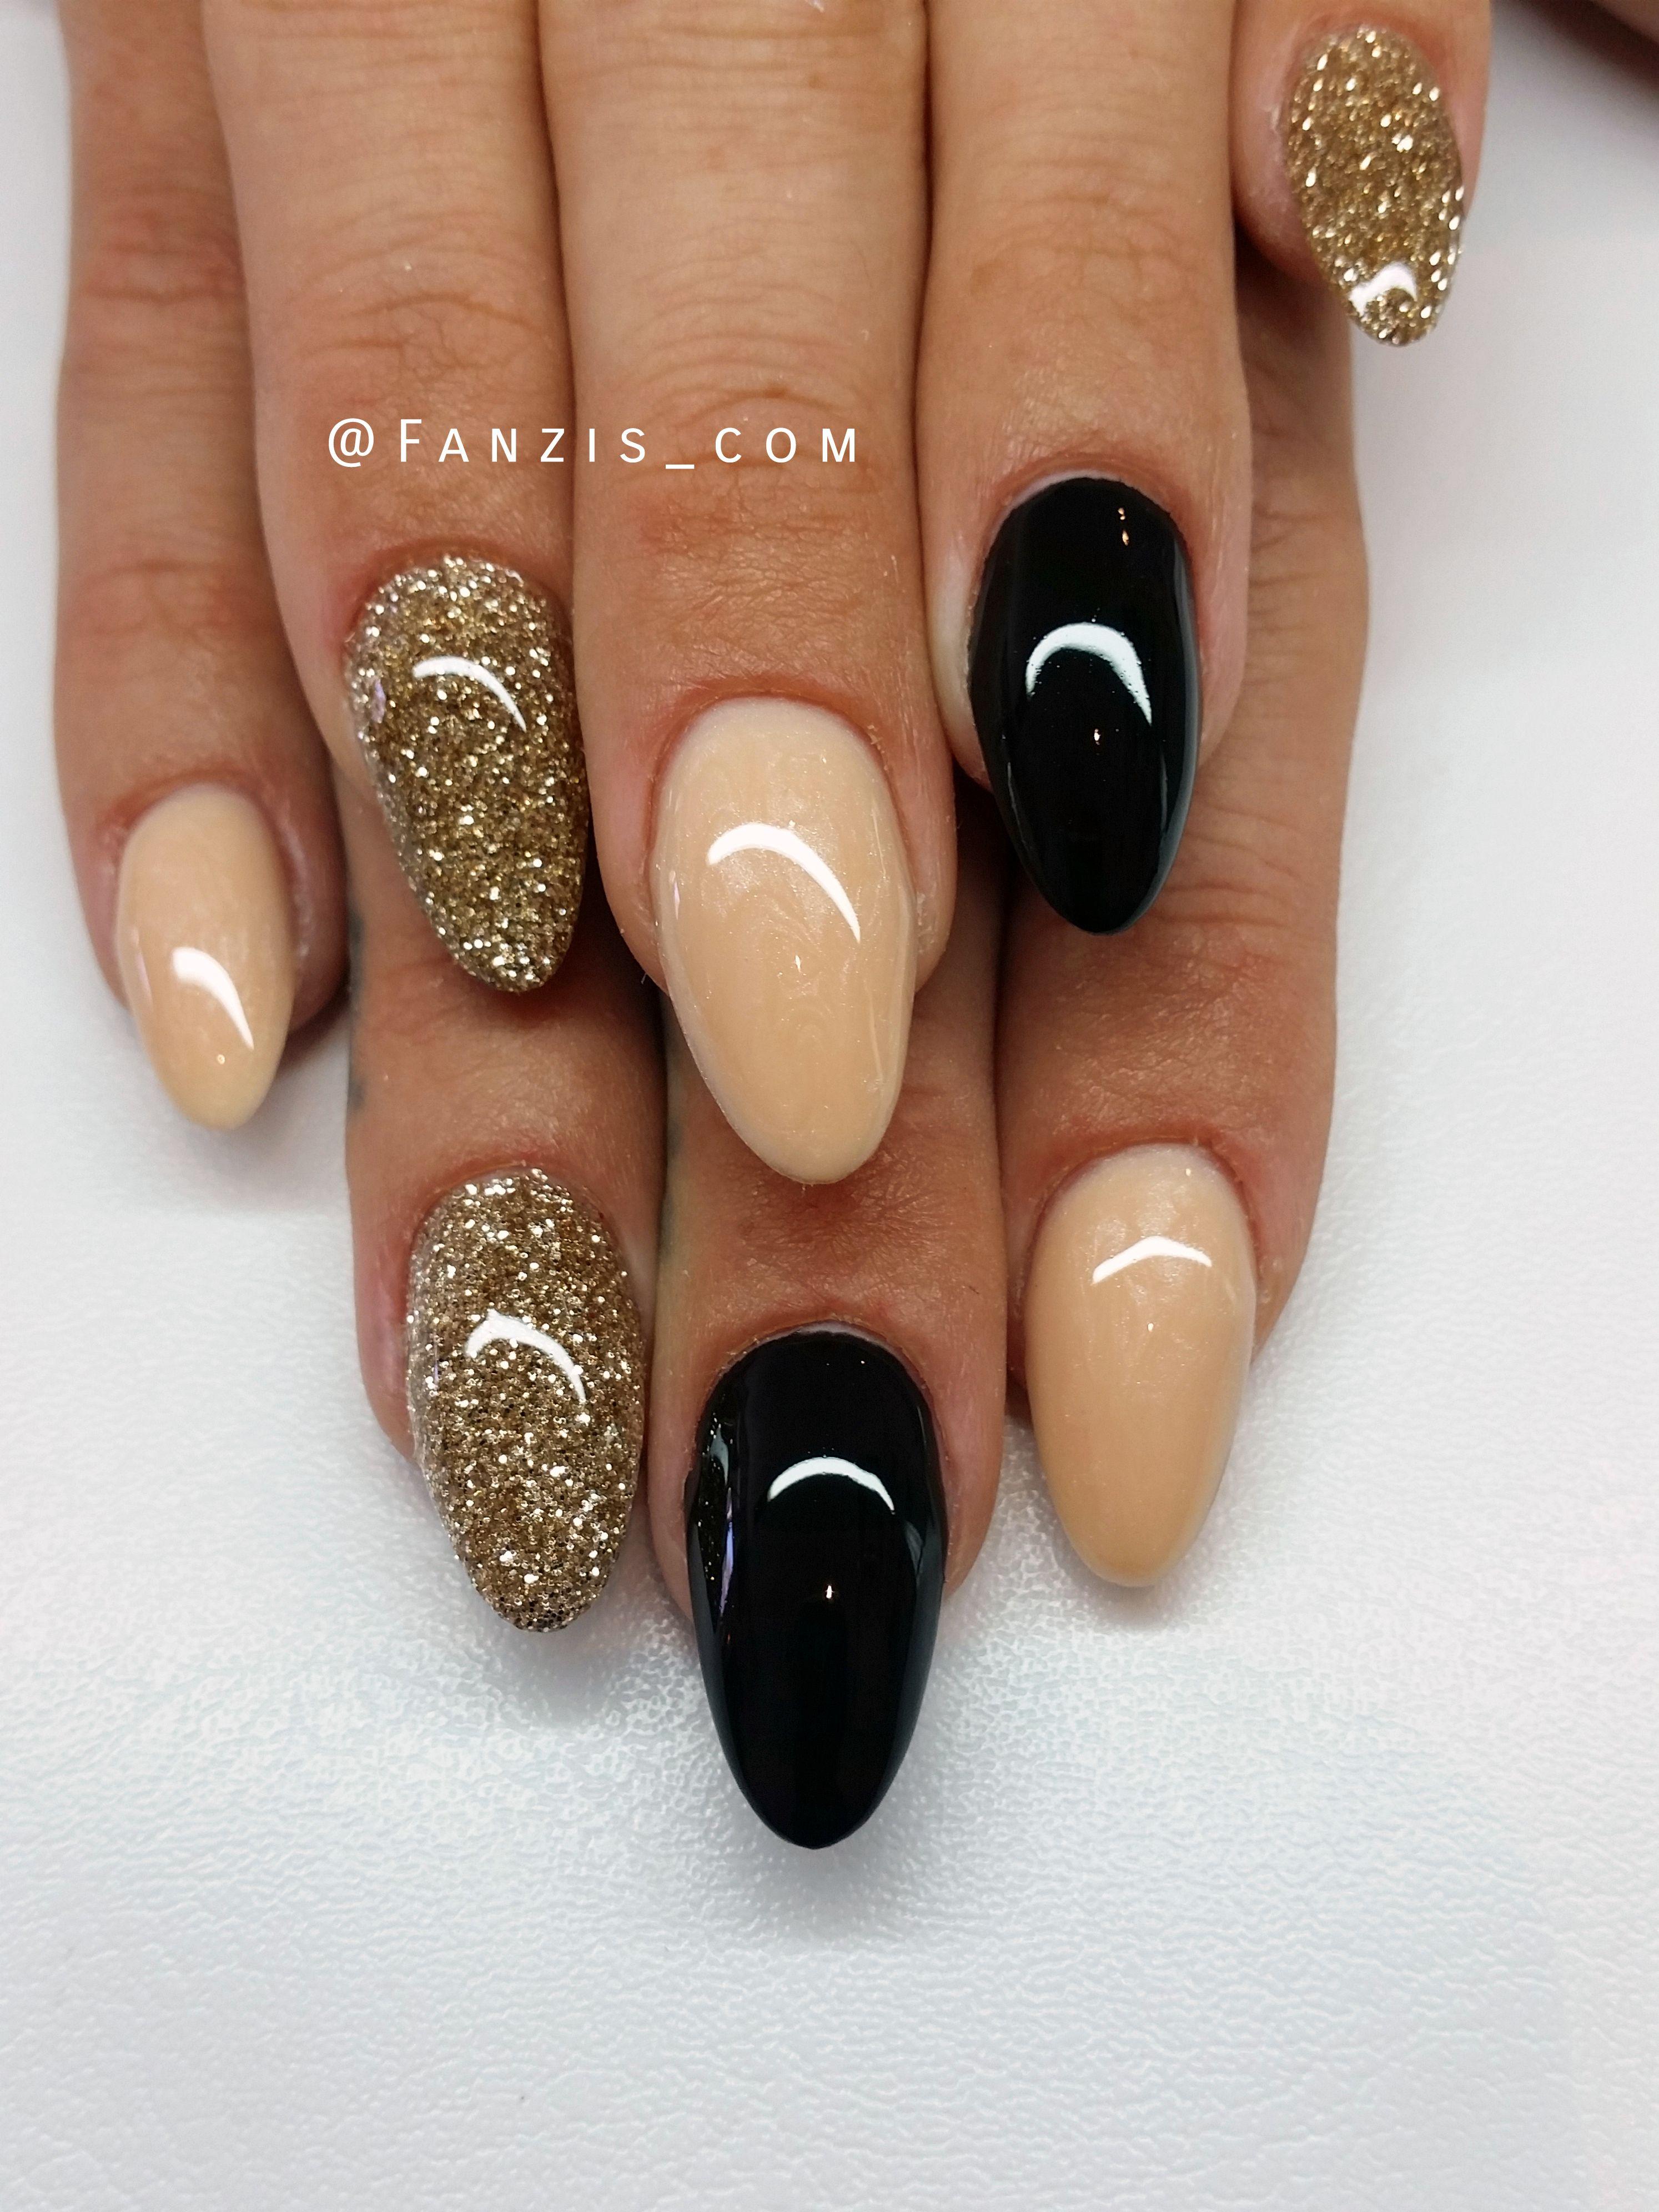 nails.quenalbertini: Nude, gold and black nails   fanzis_com